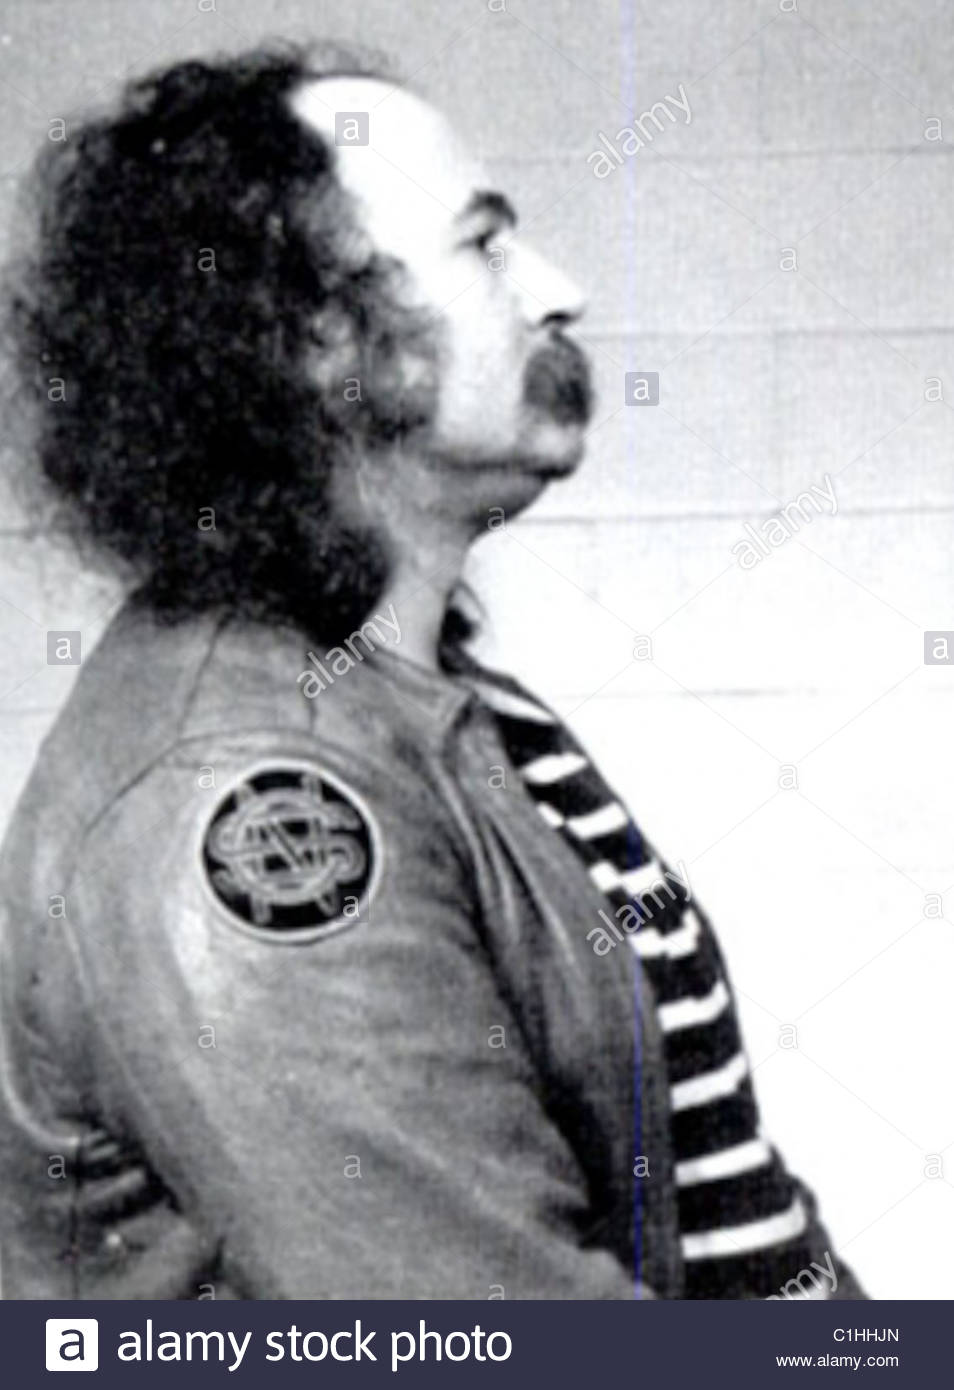 David Van Cortlandt Crosby (born August 14, 1941) is an